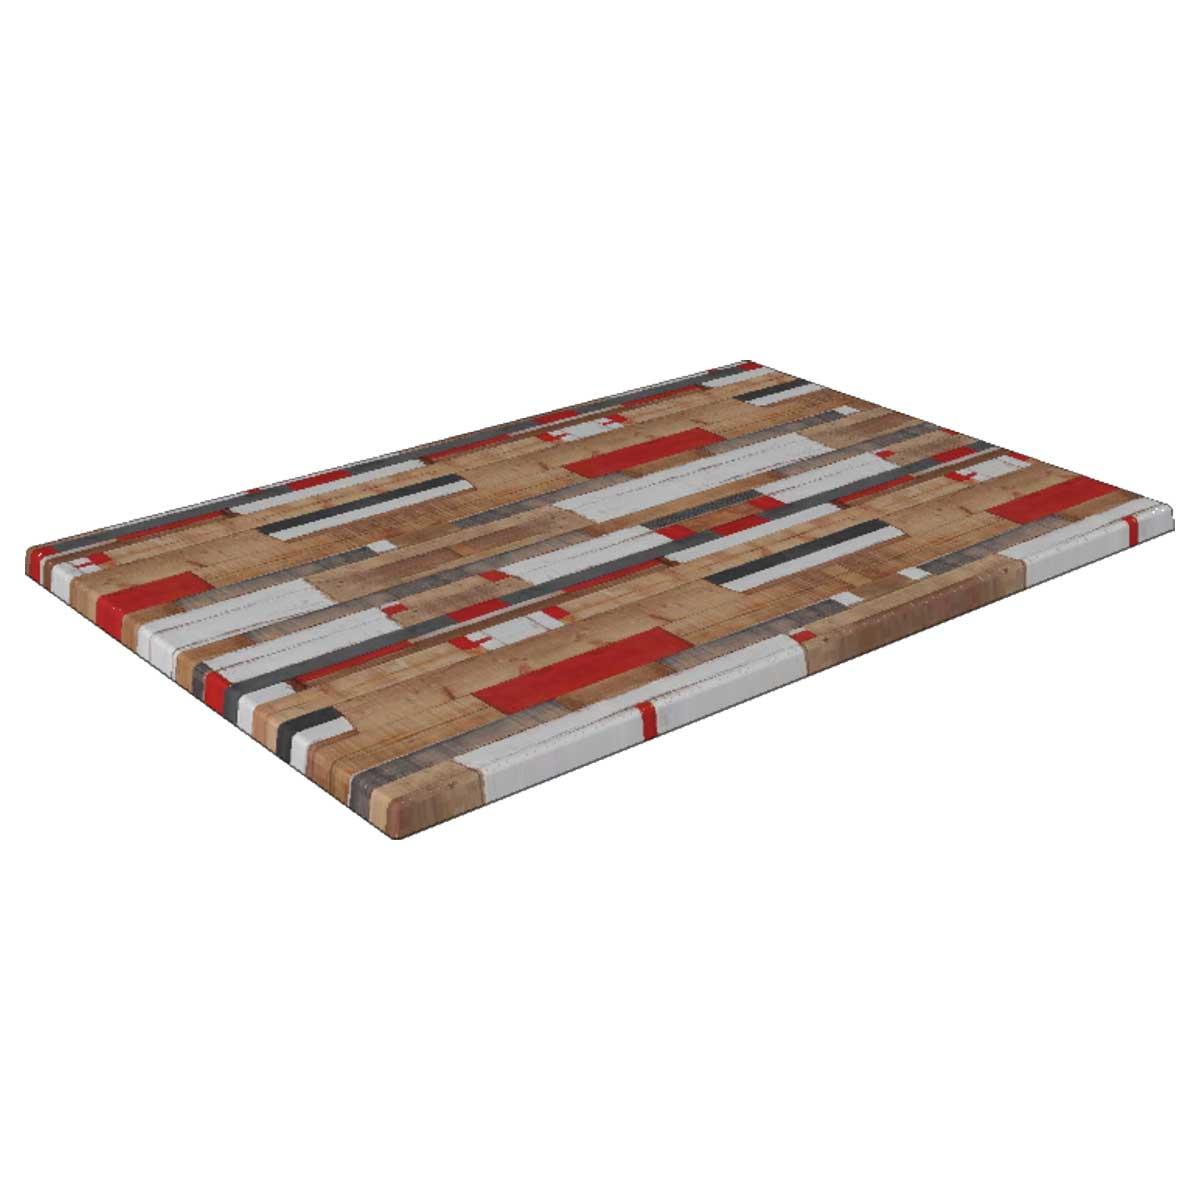 TICLA E120X80 271 - https://www.werzalit.com/fr/produit/plateau-de-table-classic-werzalit-e-110x70-271-kbana-rot/